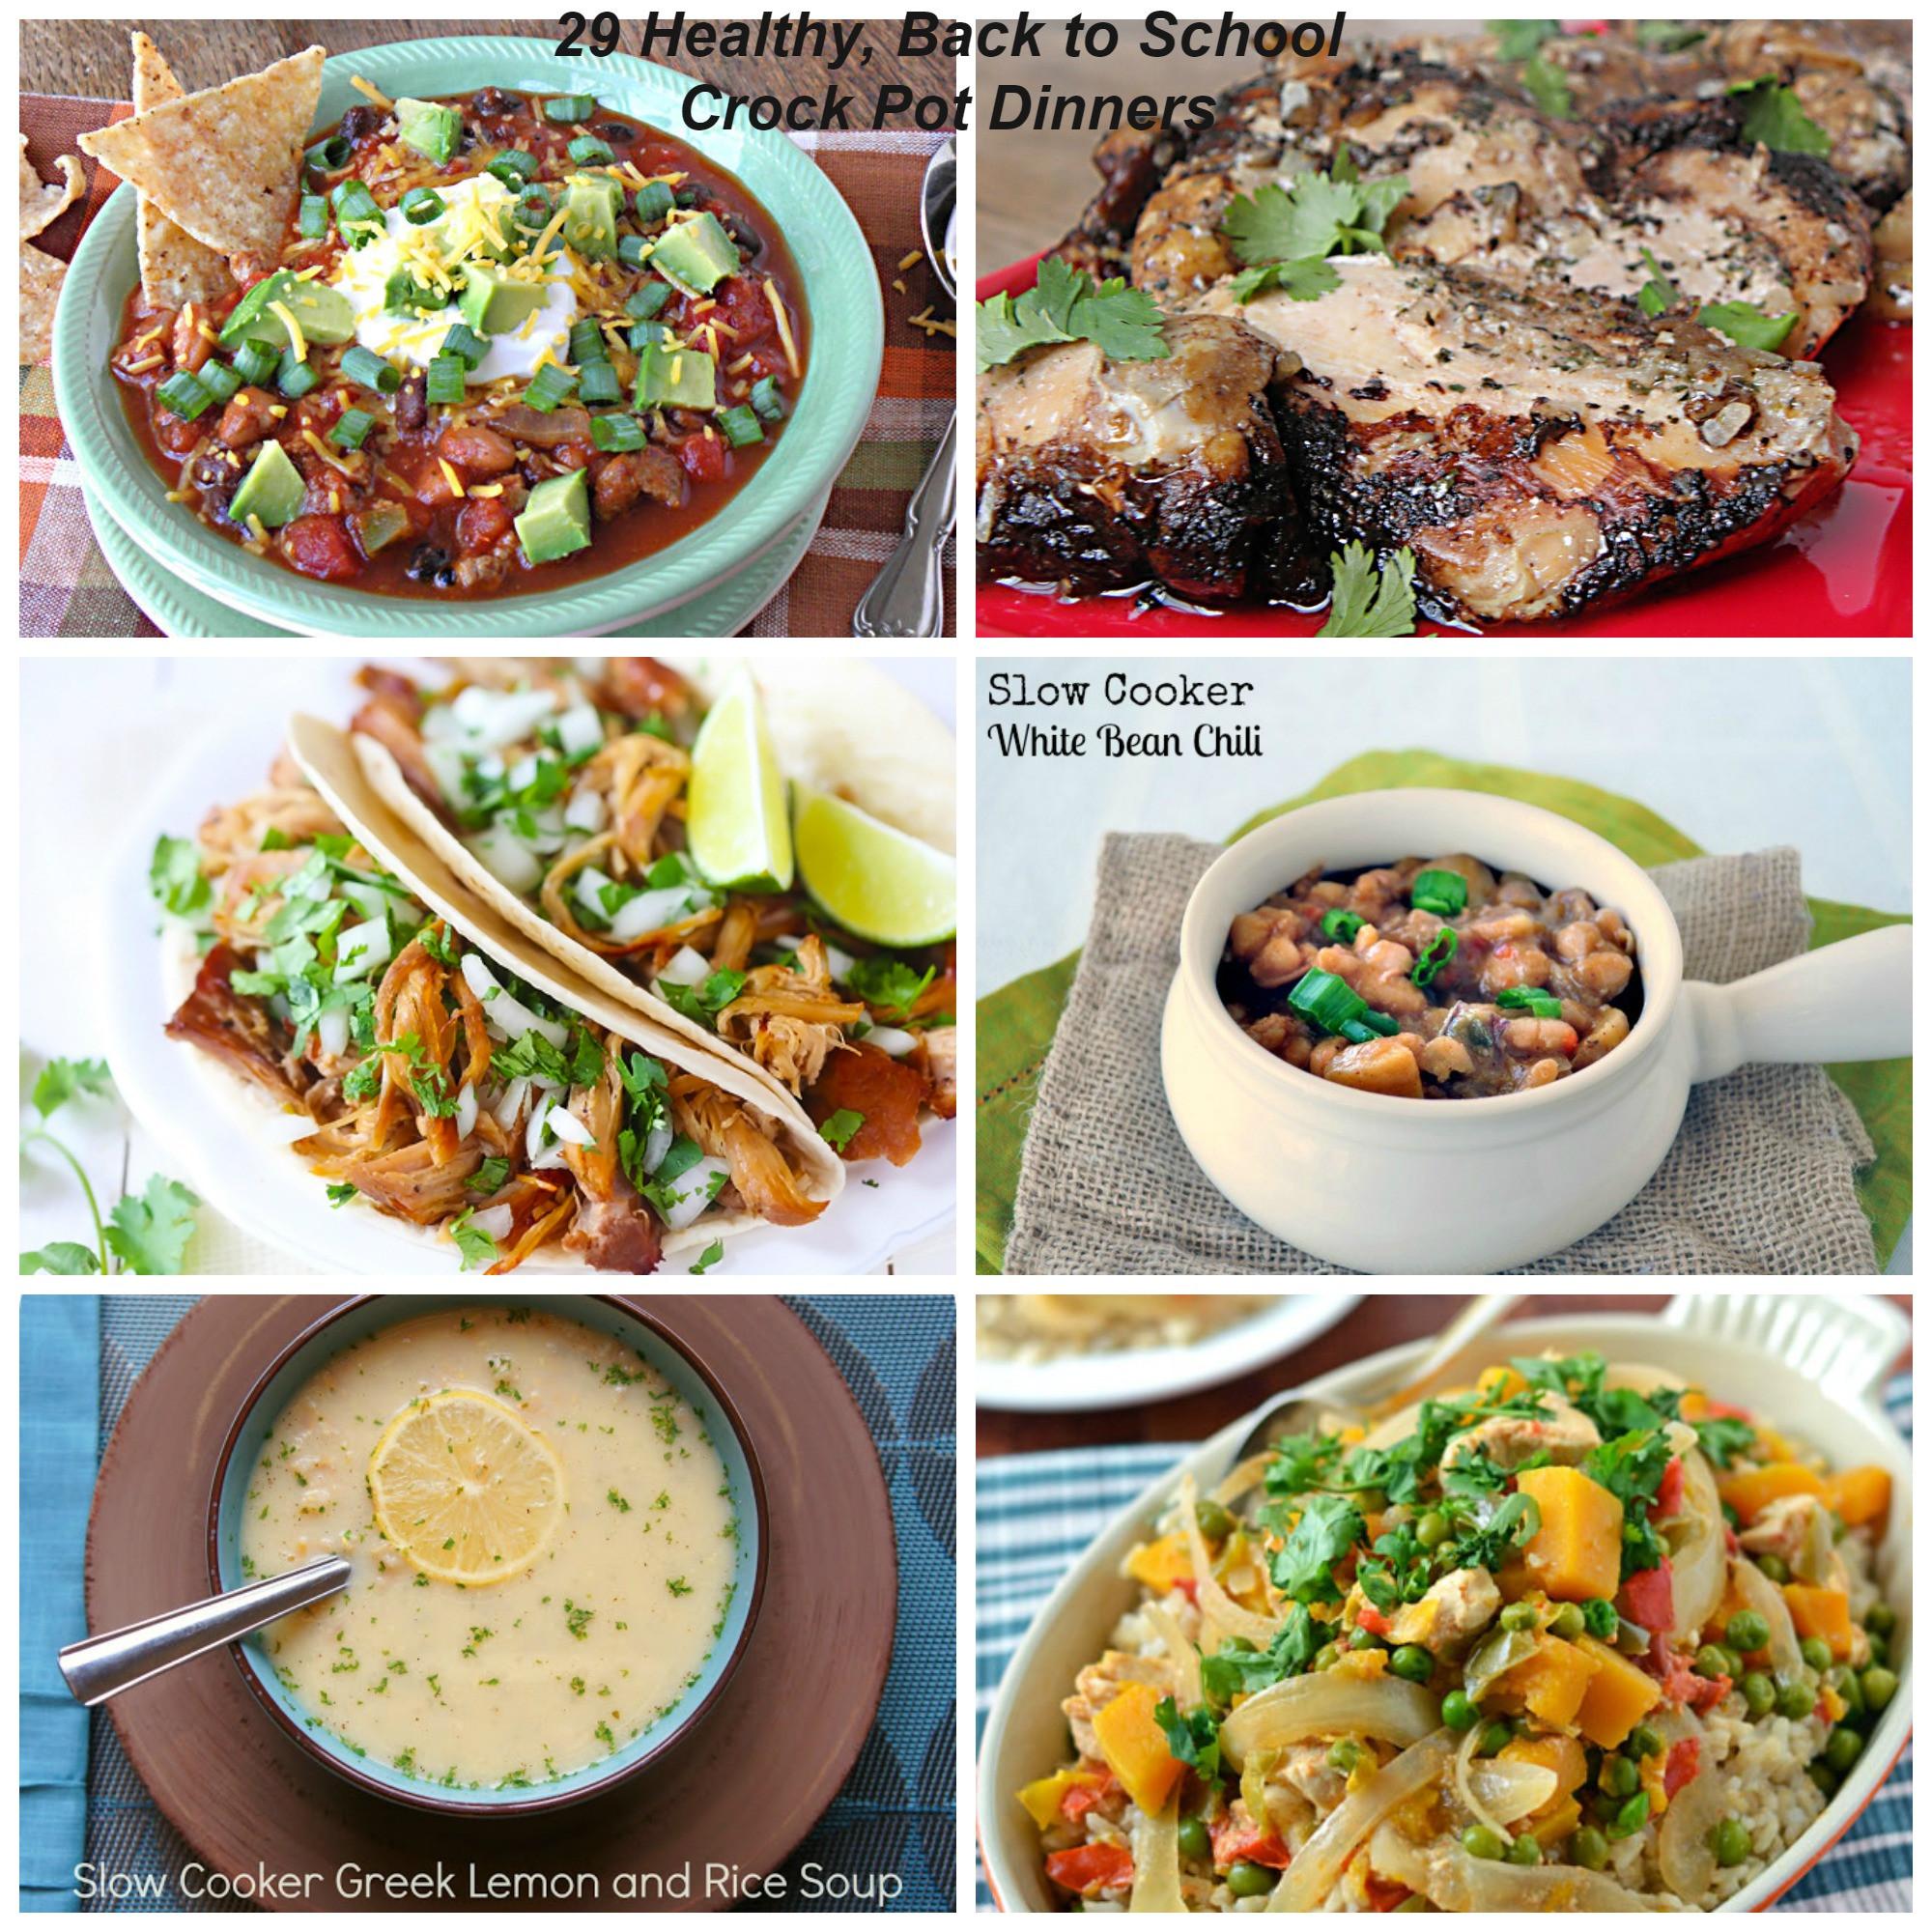 Healthy Crock Pot Dinners  29 Healthy Back to School Crock Pot Dinners